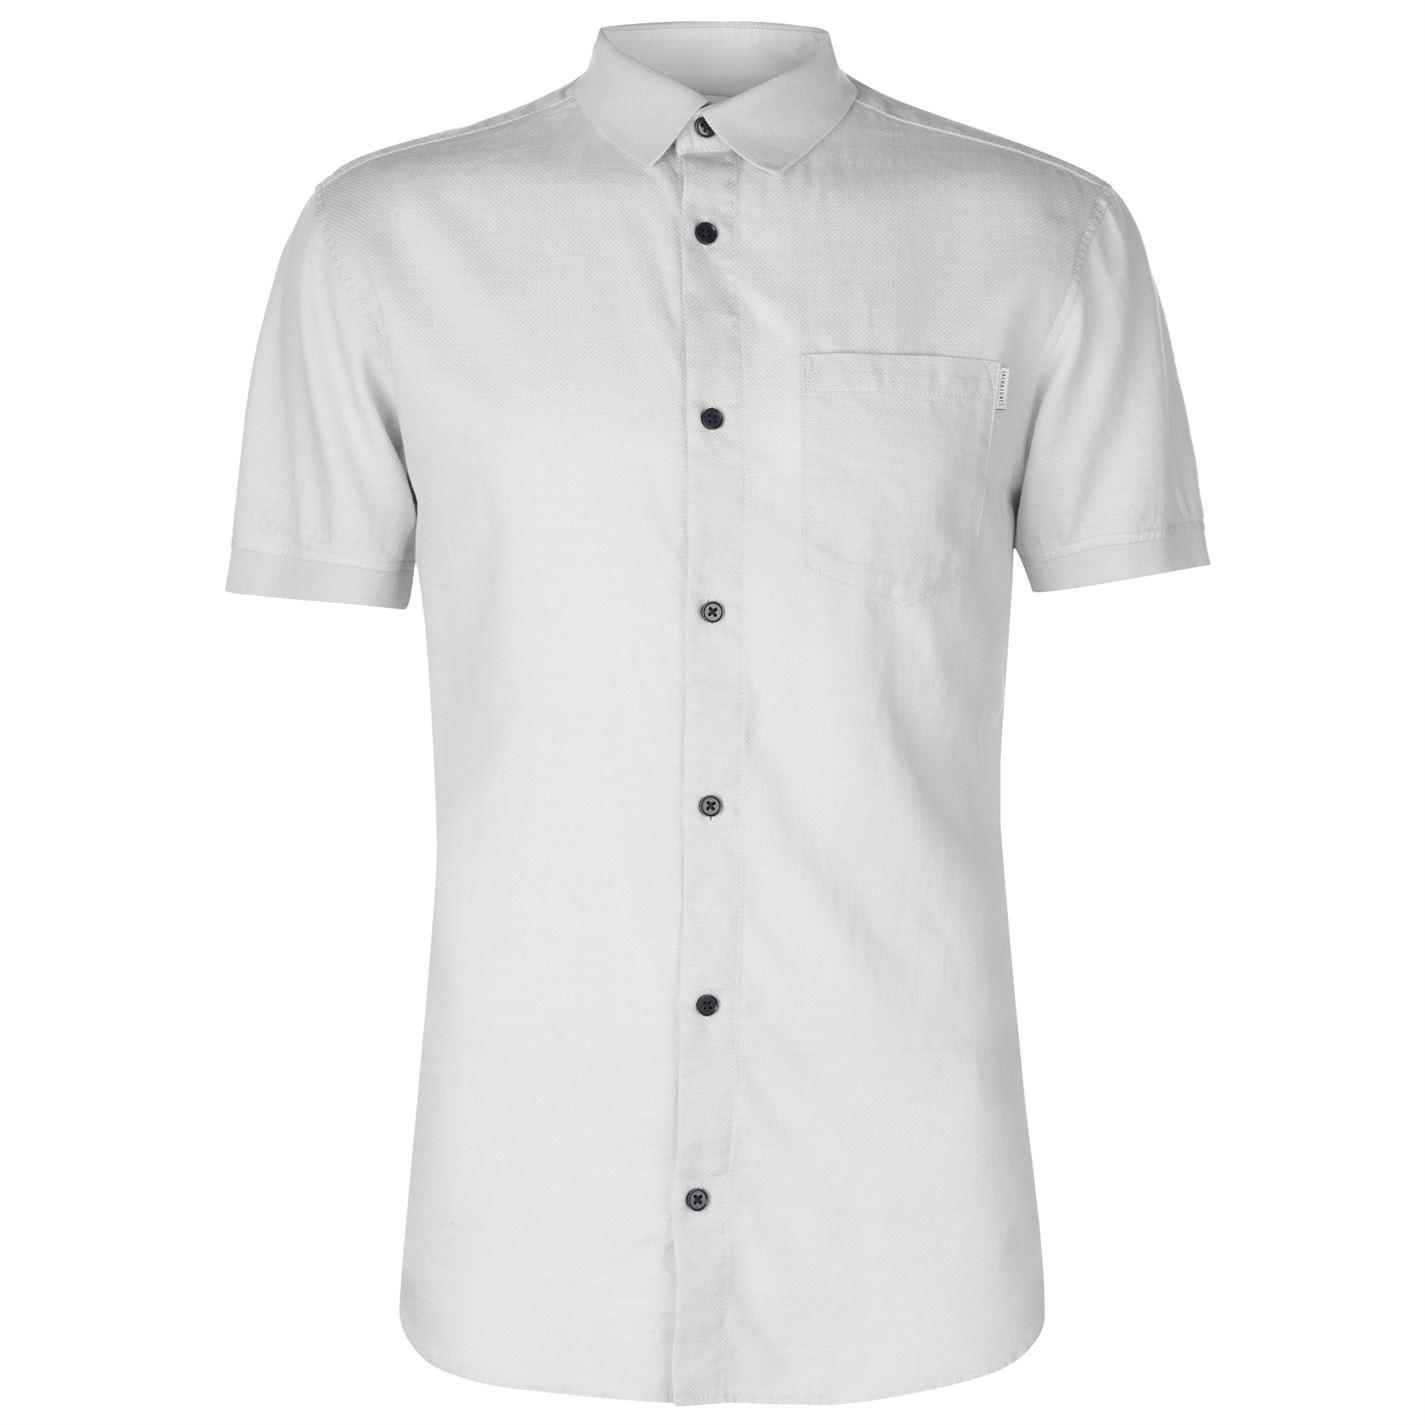 Jack and Jones Core Glendale Short Sleeve Shirt